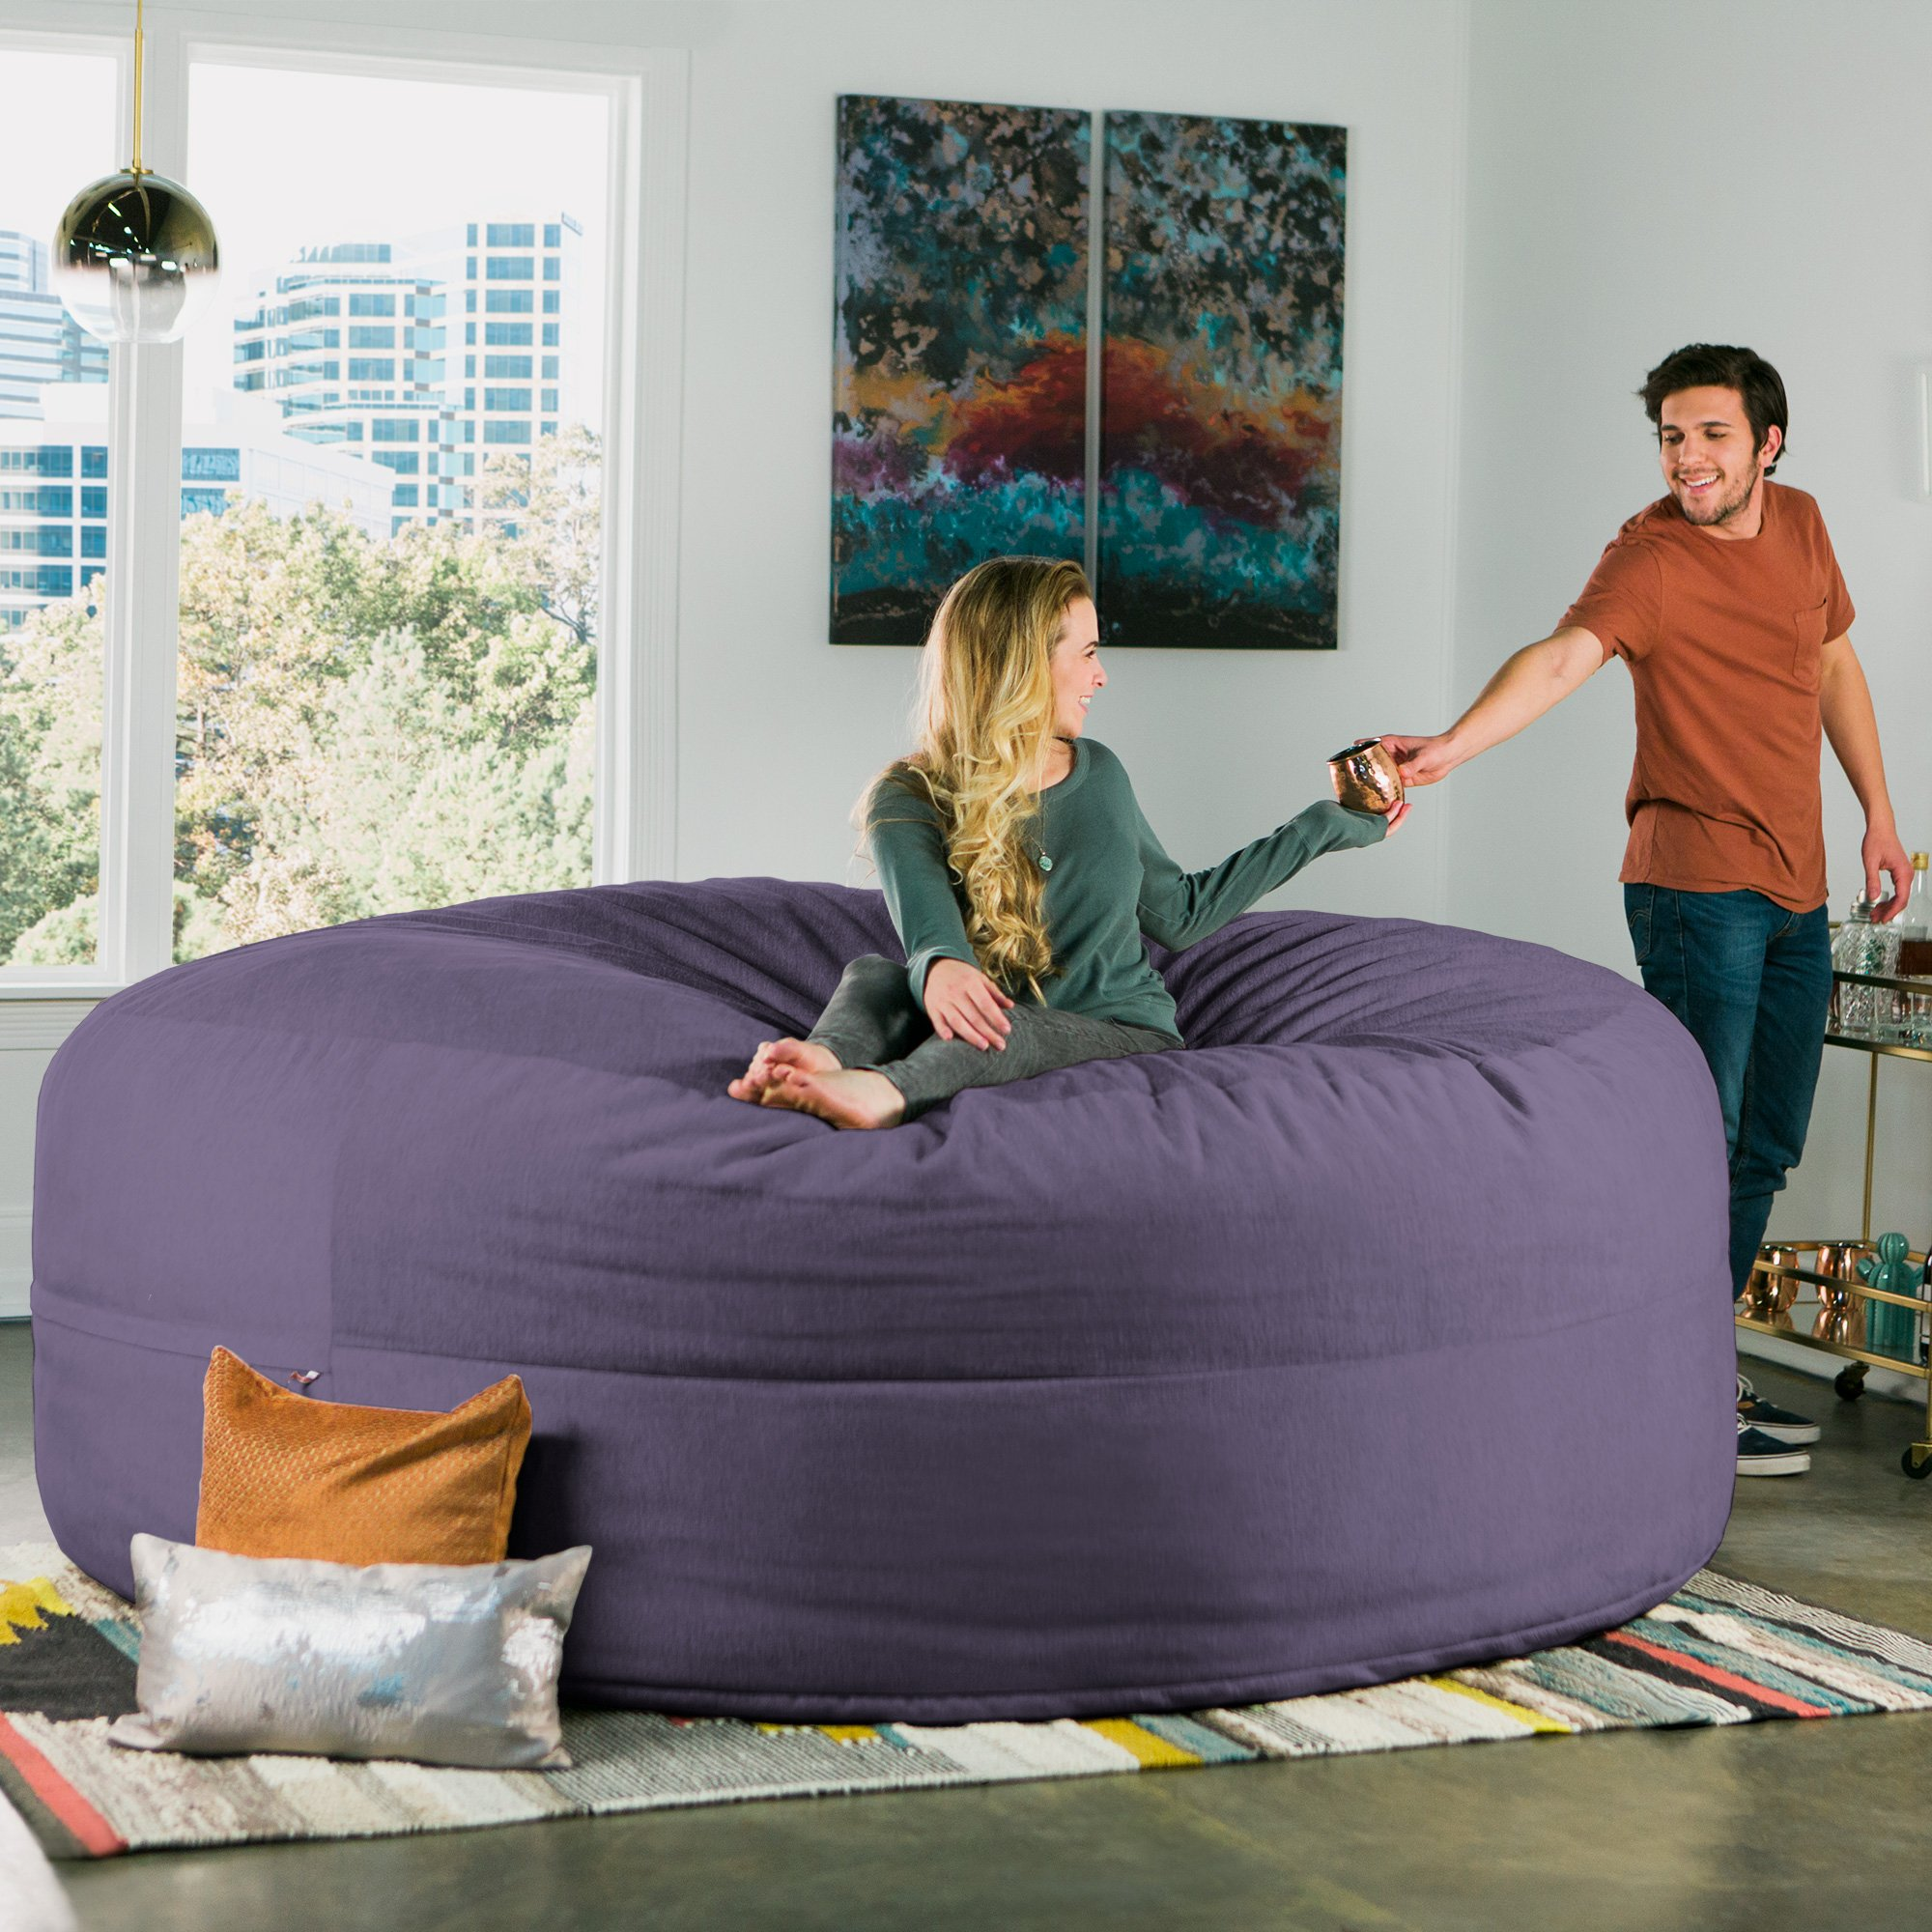 Jaxx Cocoon 8 Foot Huge Sleeper Bean Bag Bed - Chenille, Plum by Jaxx (Image #5)